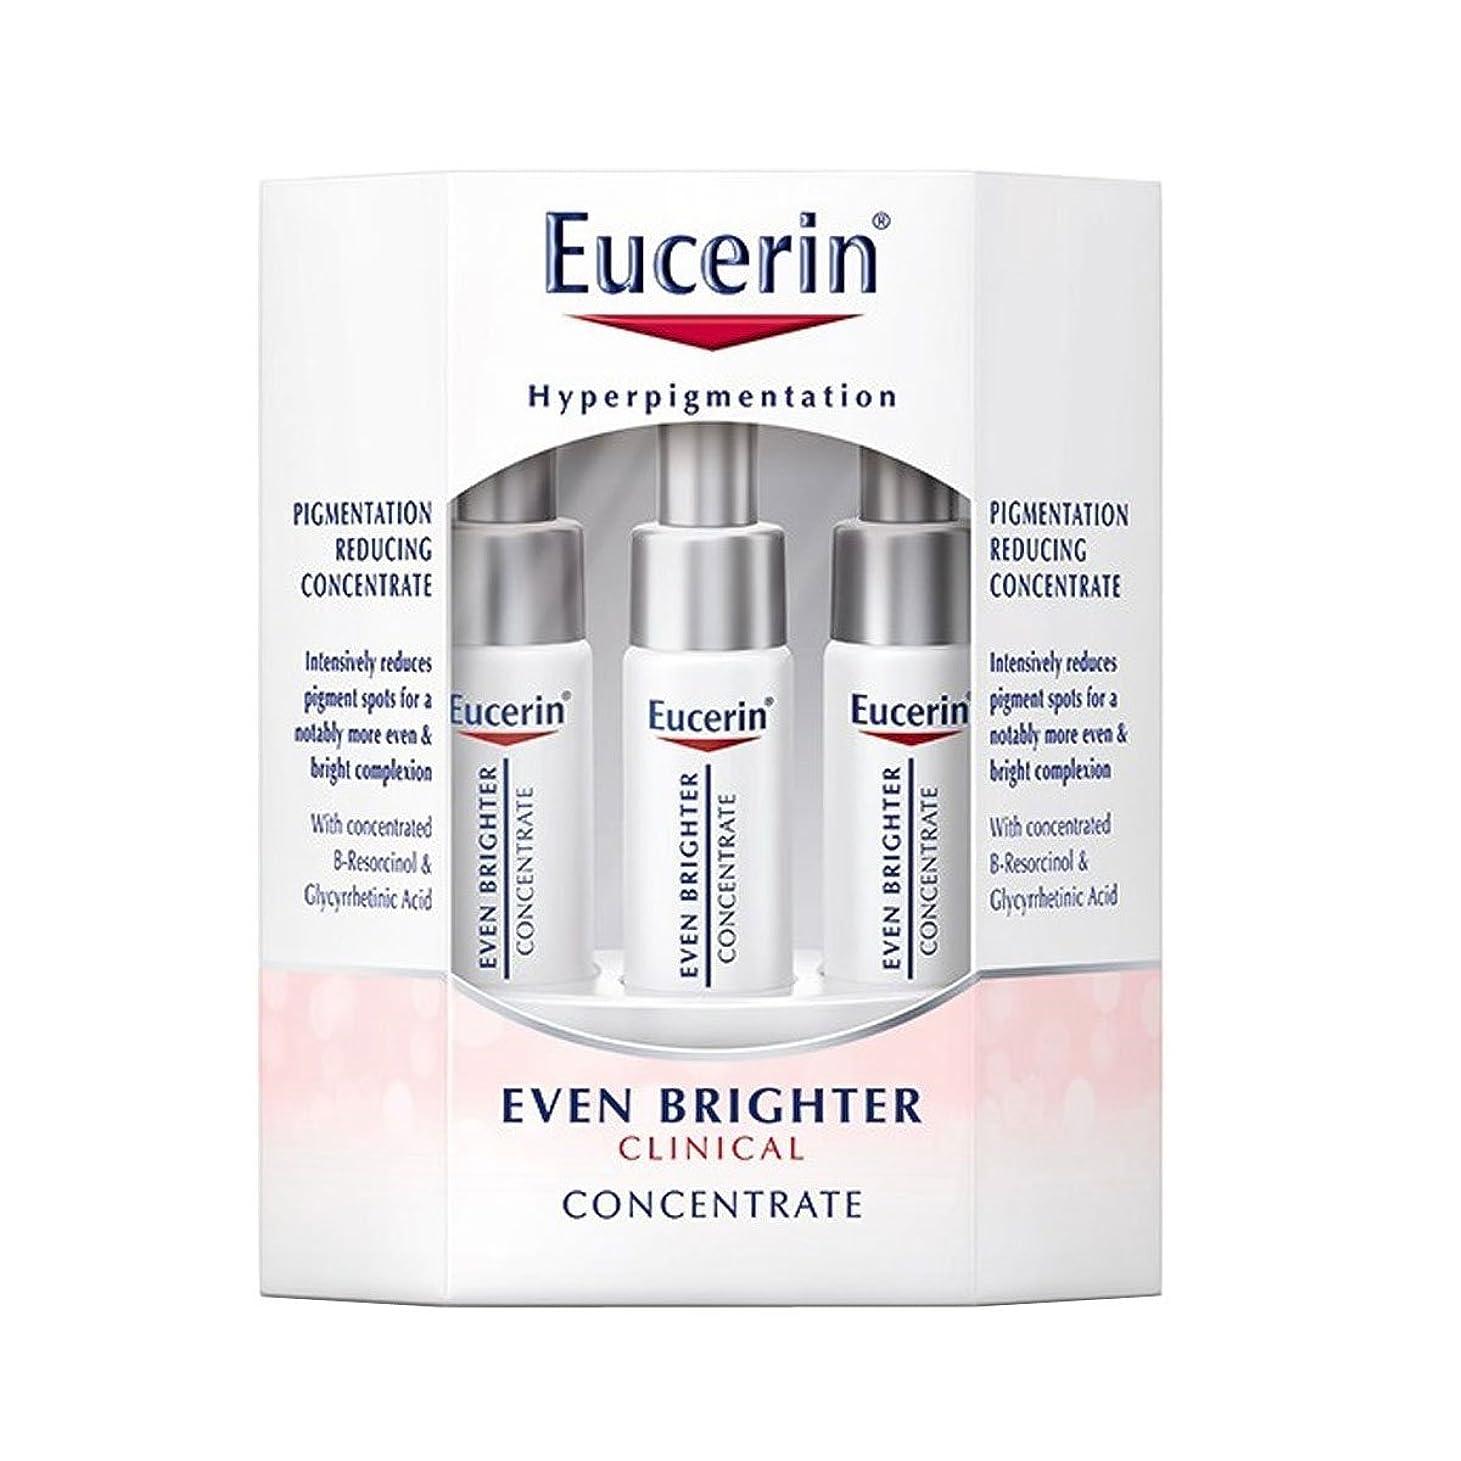 分散改革使用法Eucerin Even Brighter Concentrate 6x5ml [並行輸入品]